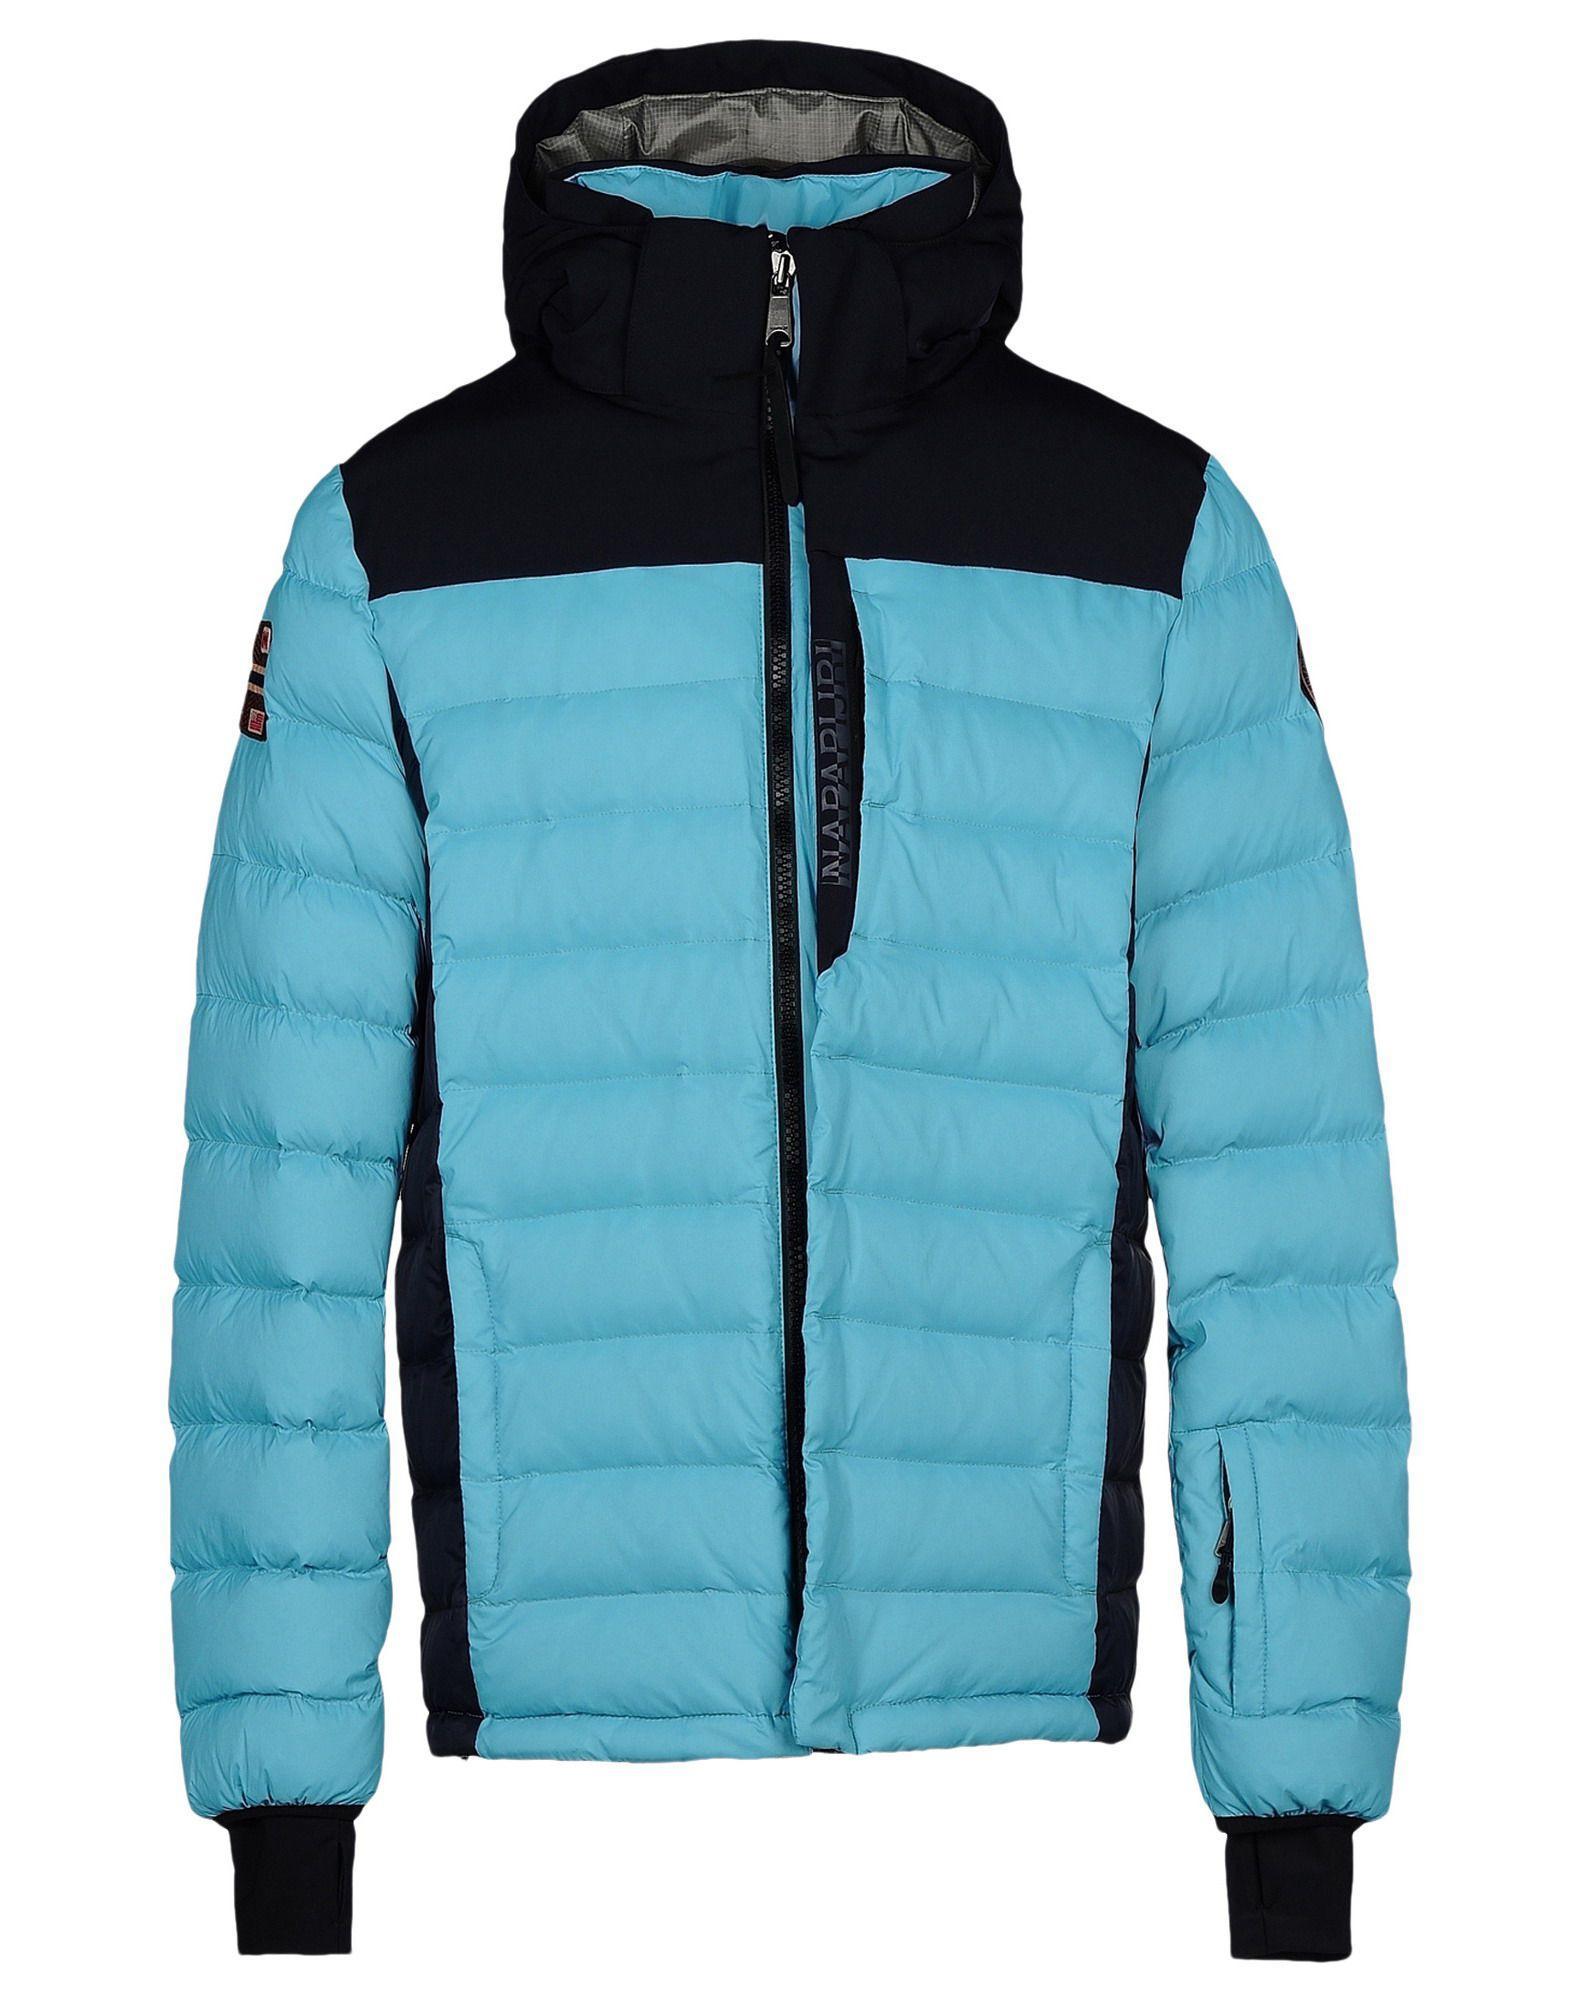 Napapijri Down Jackets In Turquoise